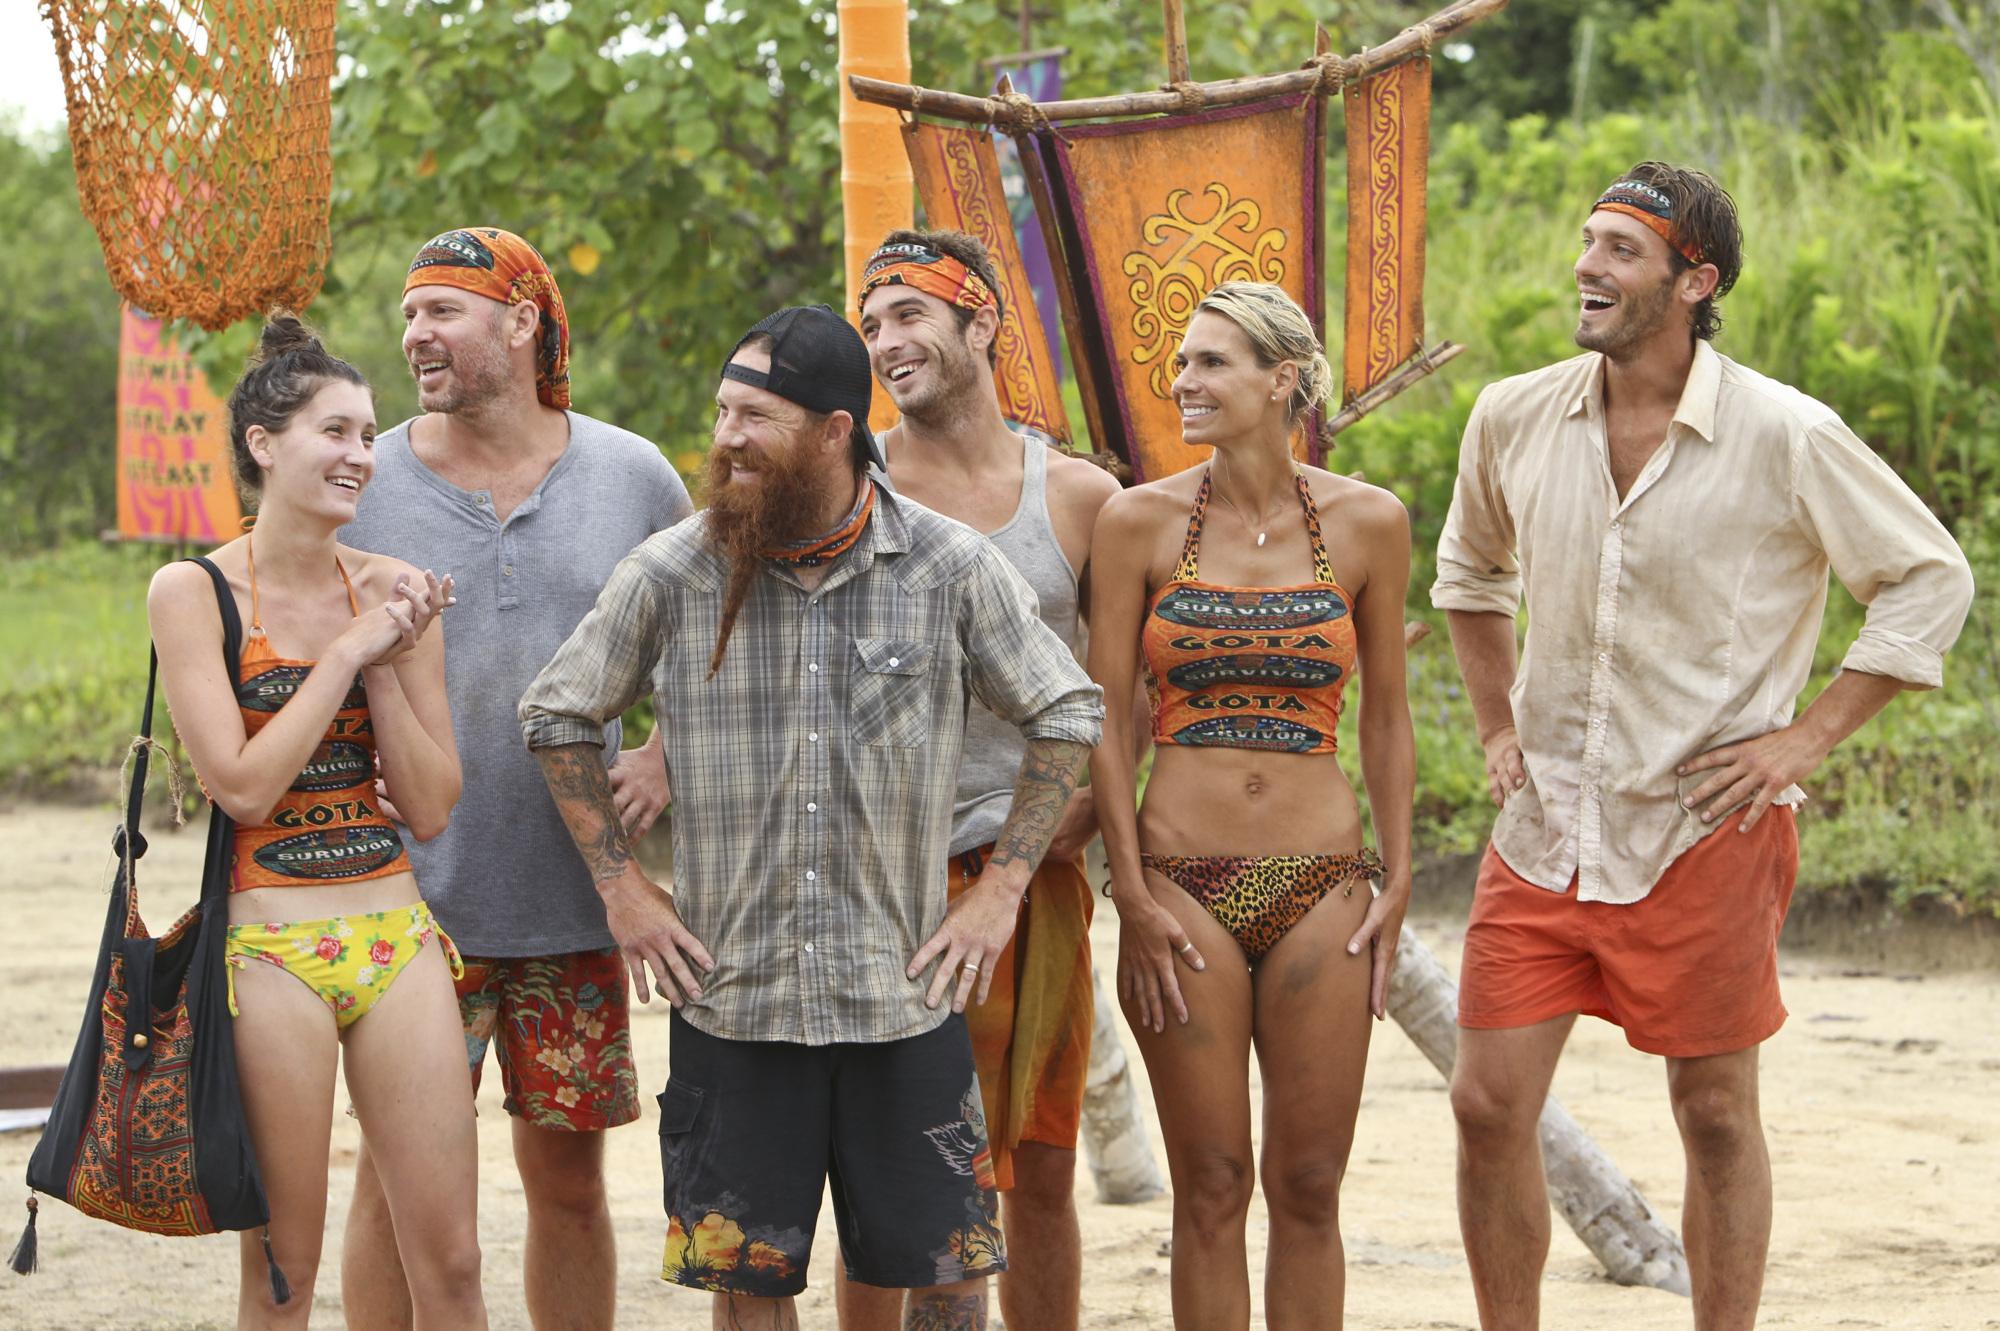 Gota Tribe in